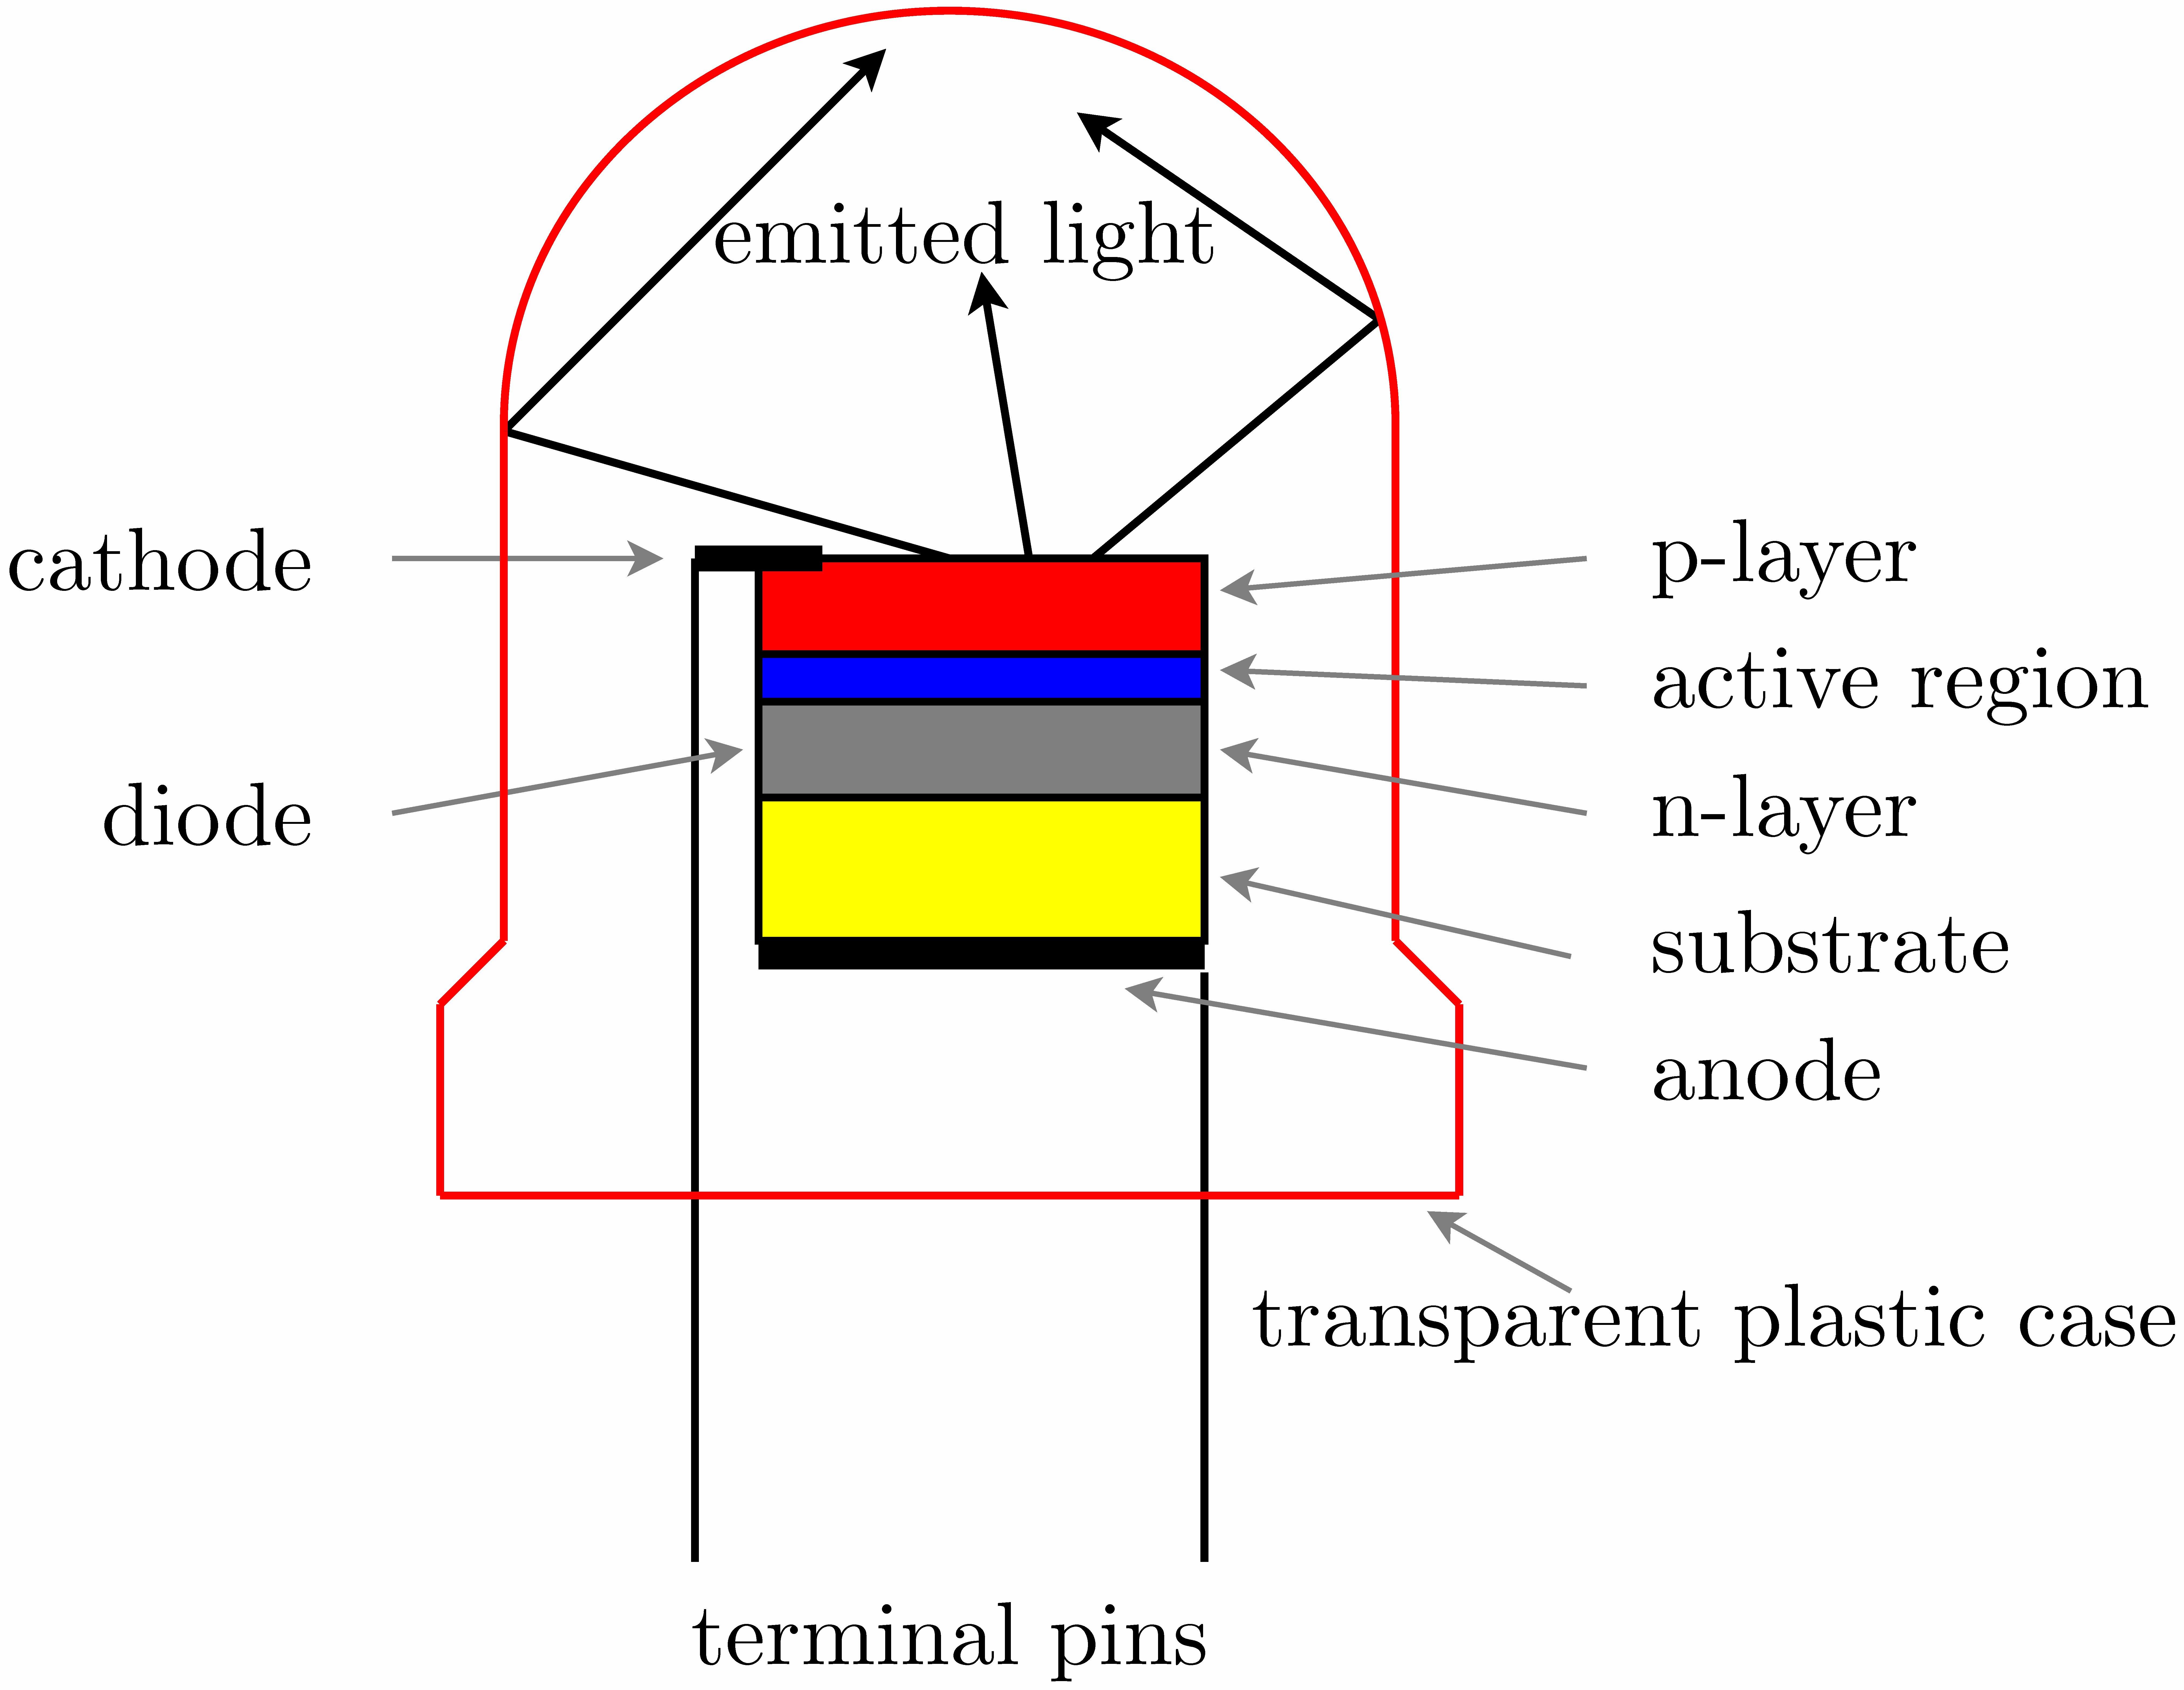 file led device jpg wikimedia commons rh commons wikimedia org organic light emitting diode band diagram light emitting diode block diagram